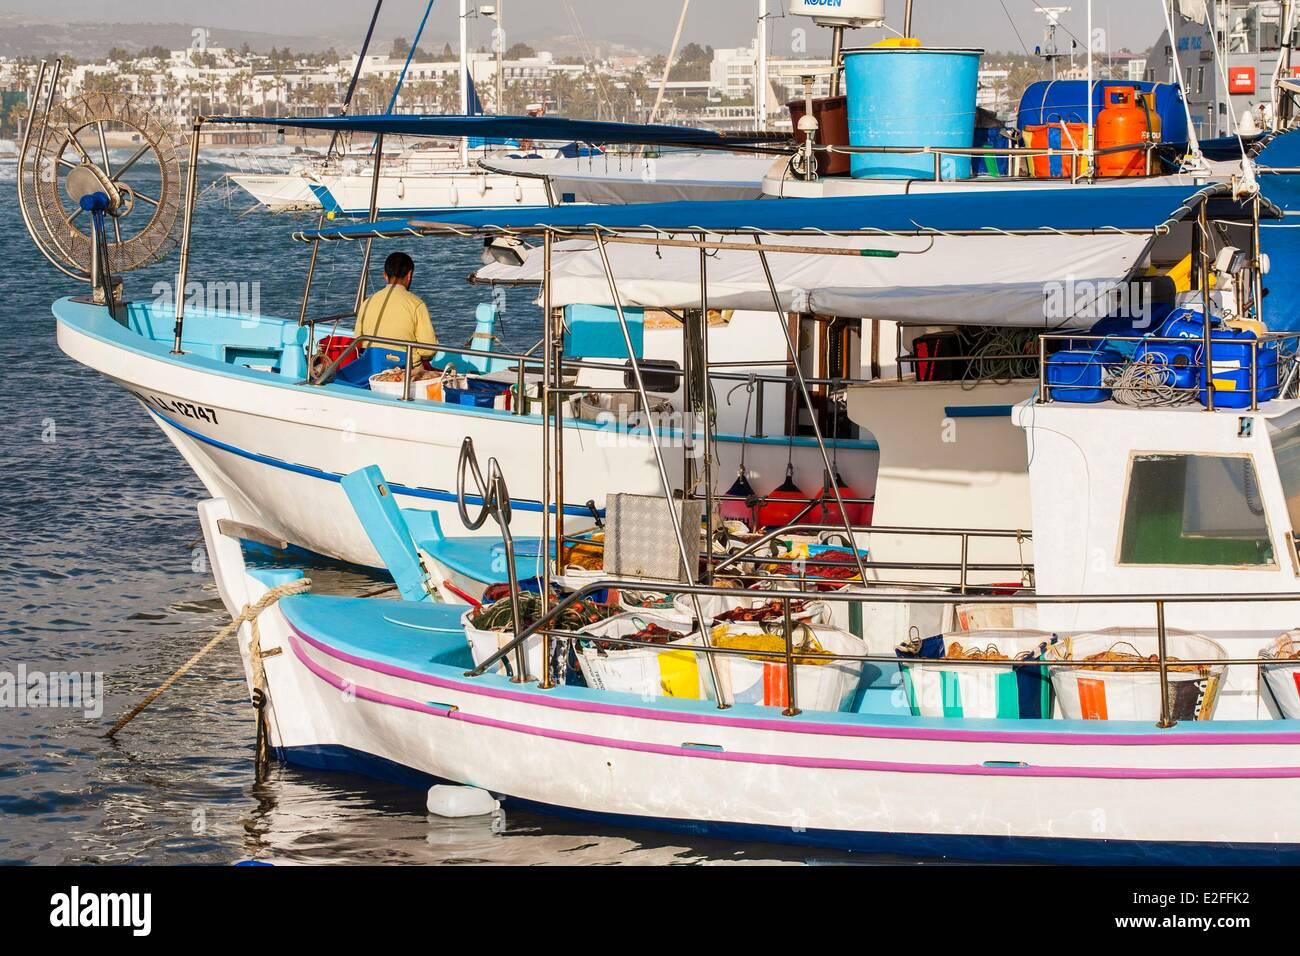 Cyprus, Paphos, fishing port - Stock Image